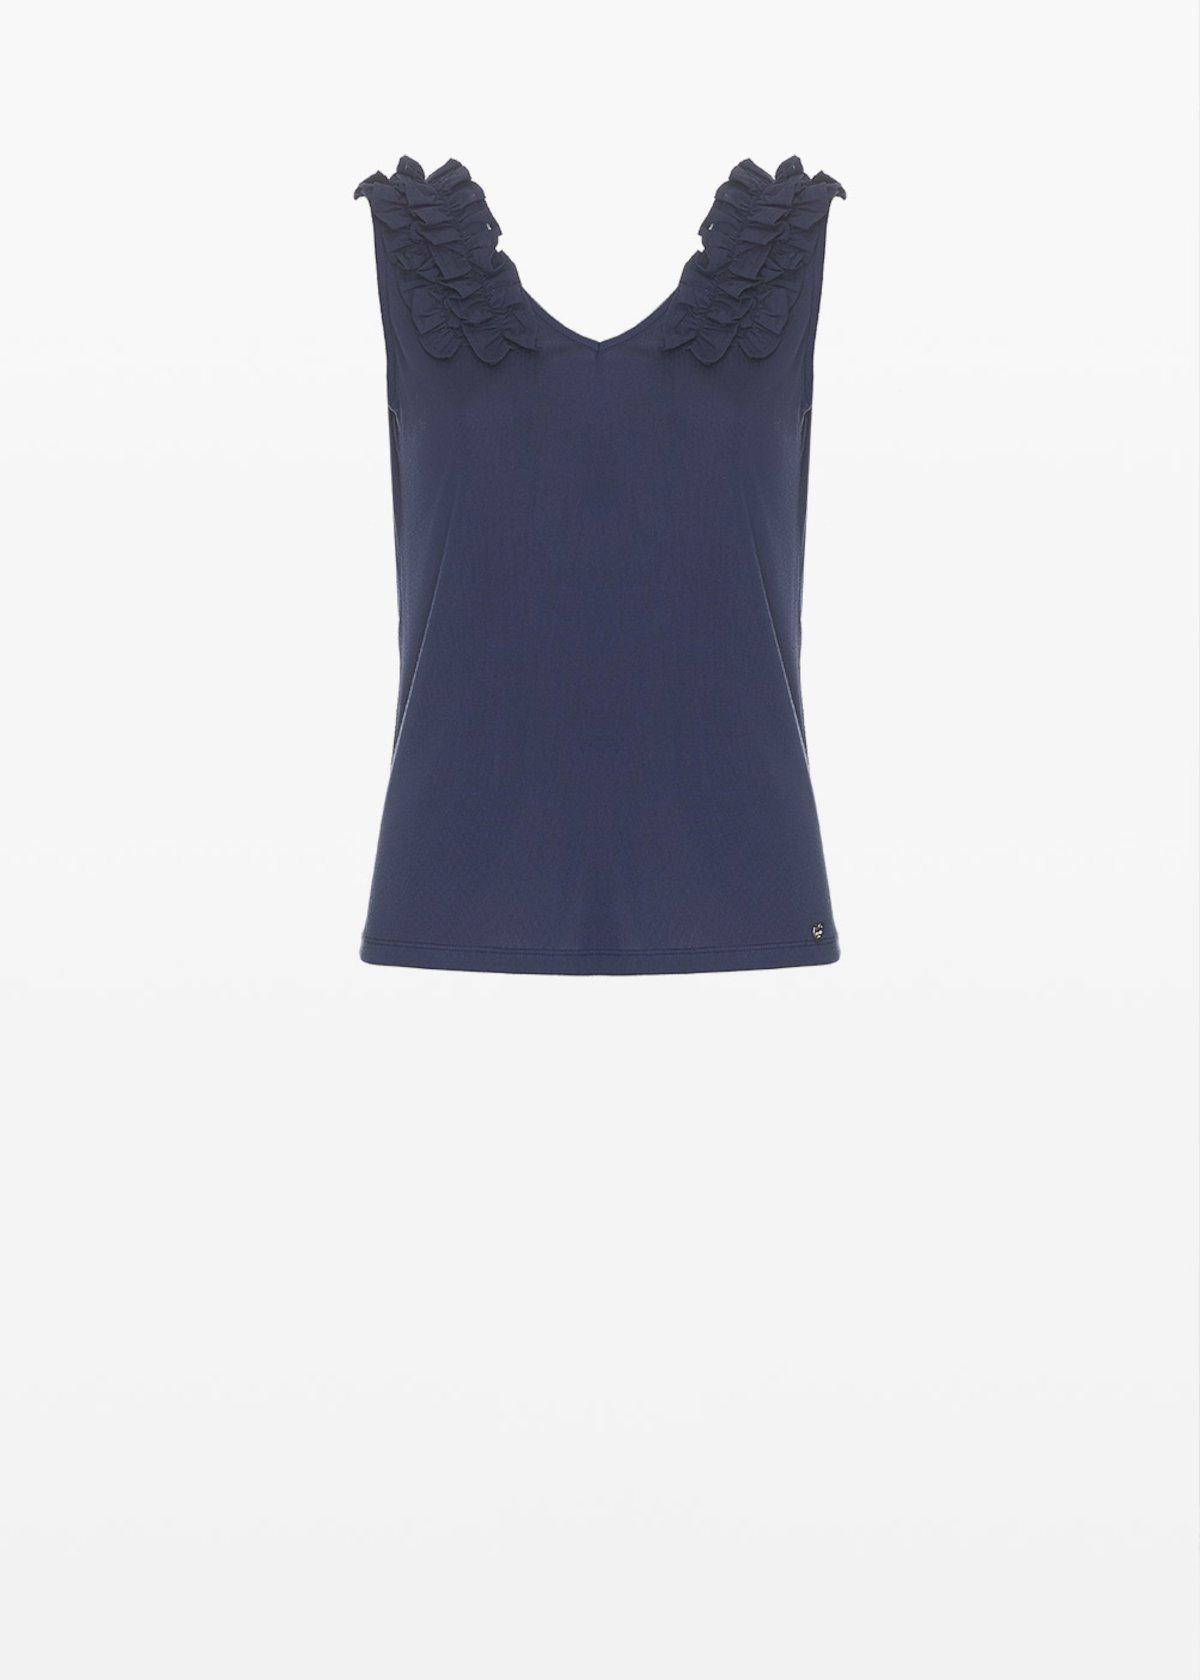 Tiko top with ruffles detail - Medium Blue - Woman - Category image